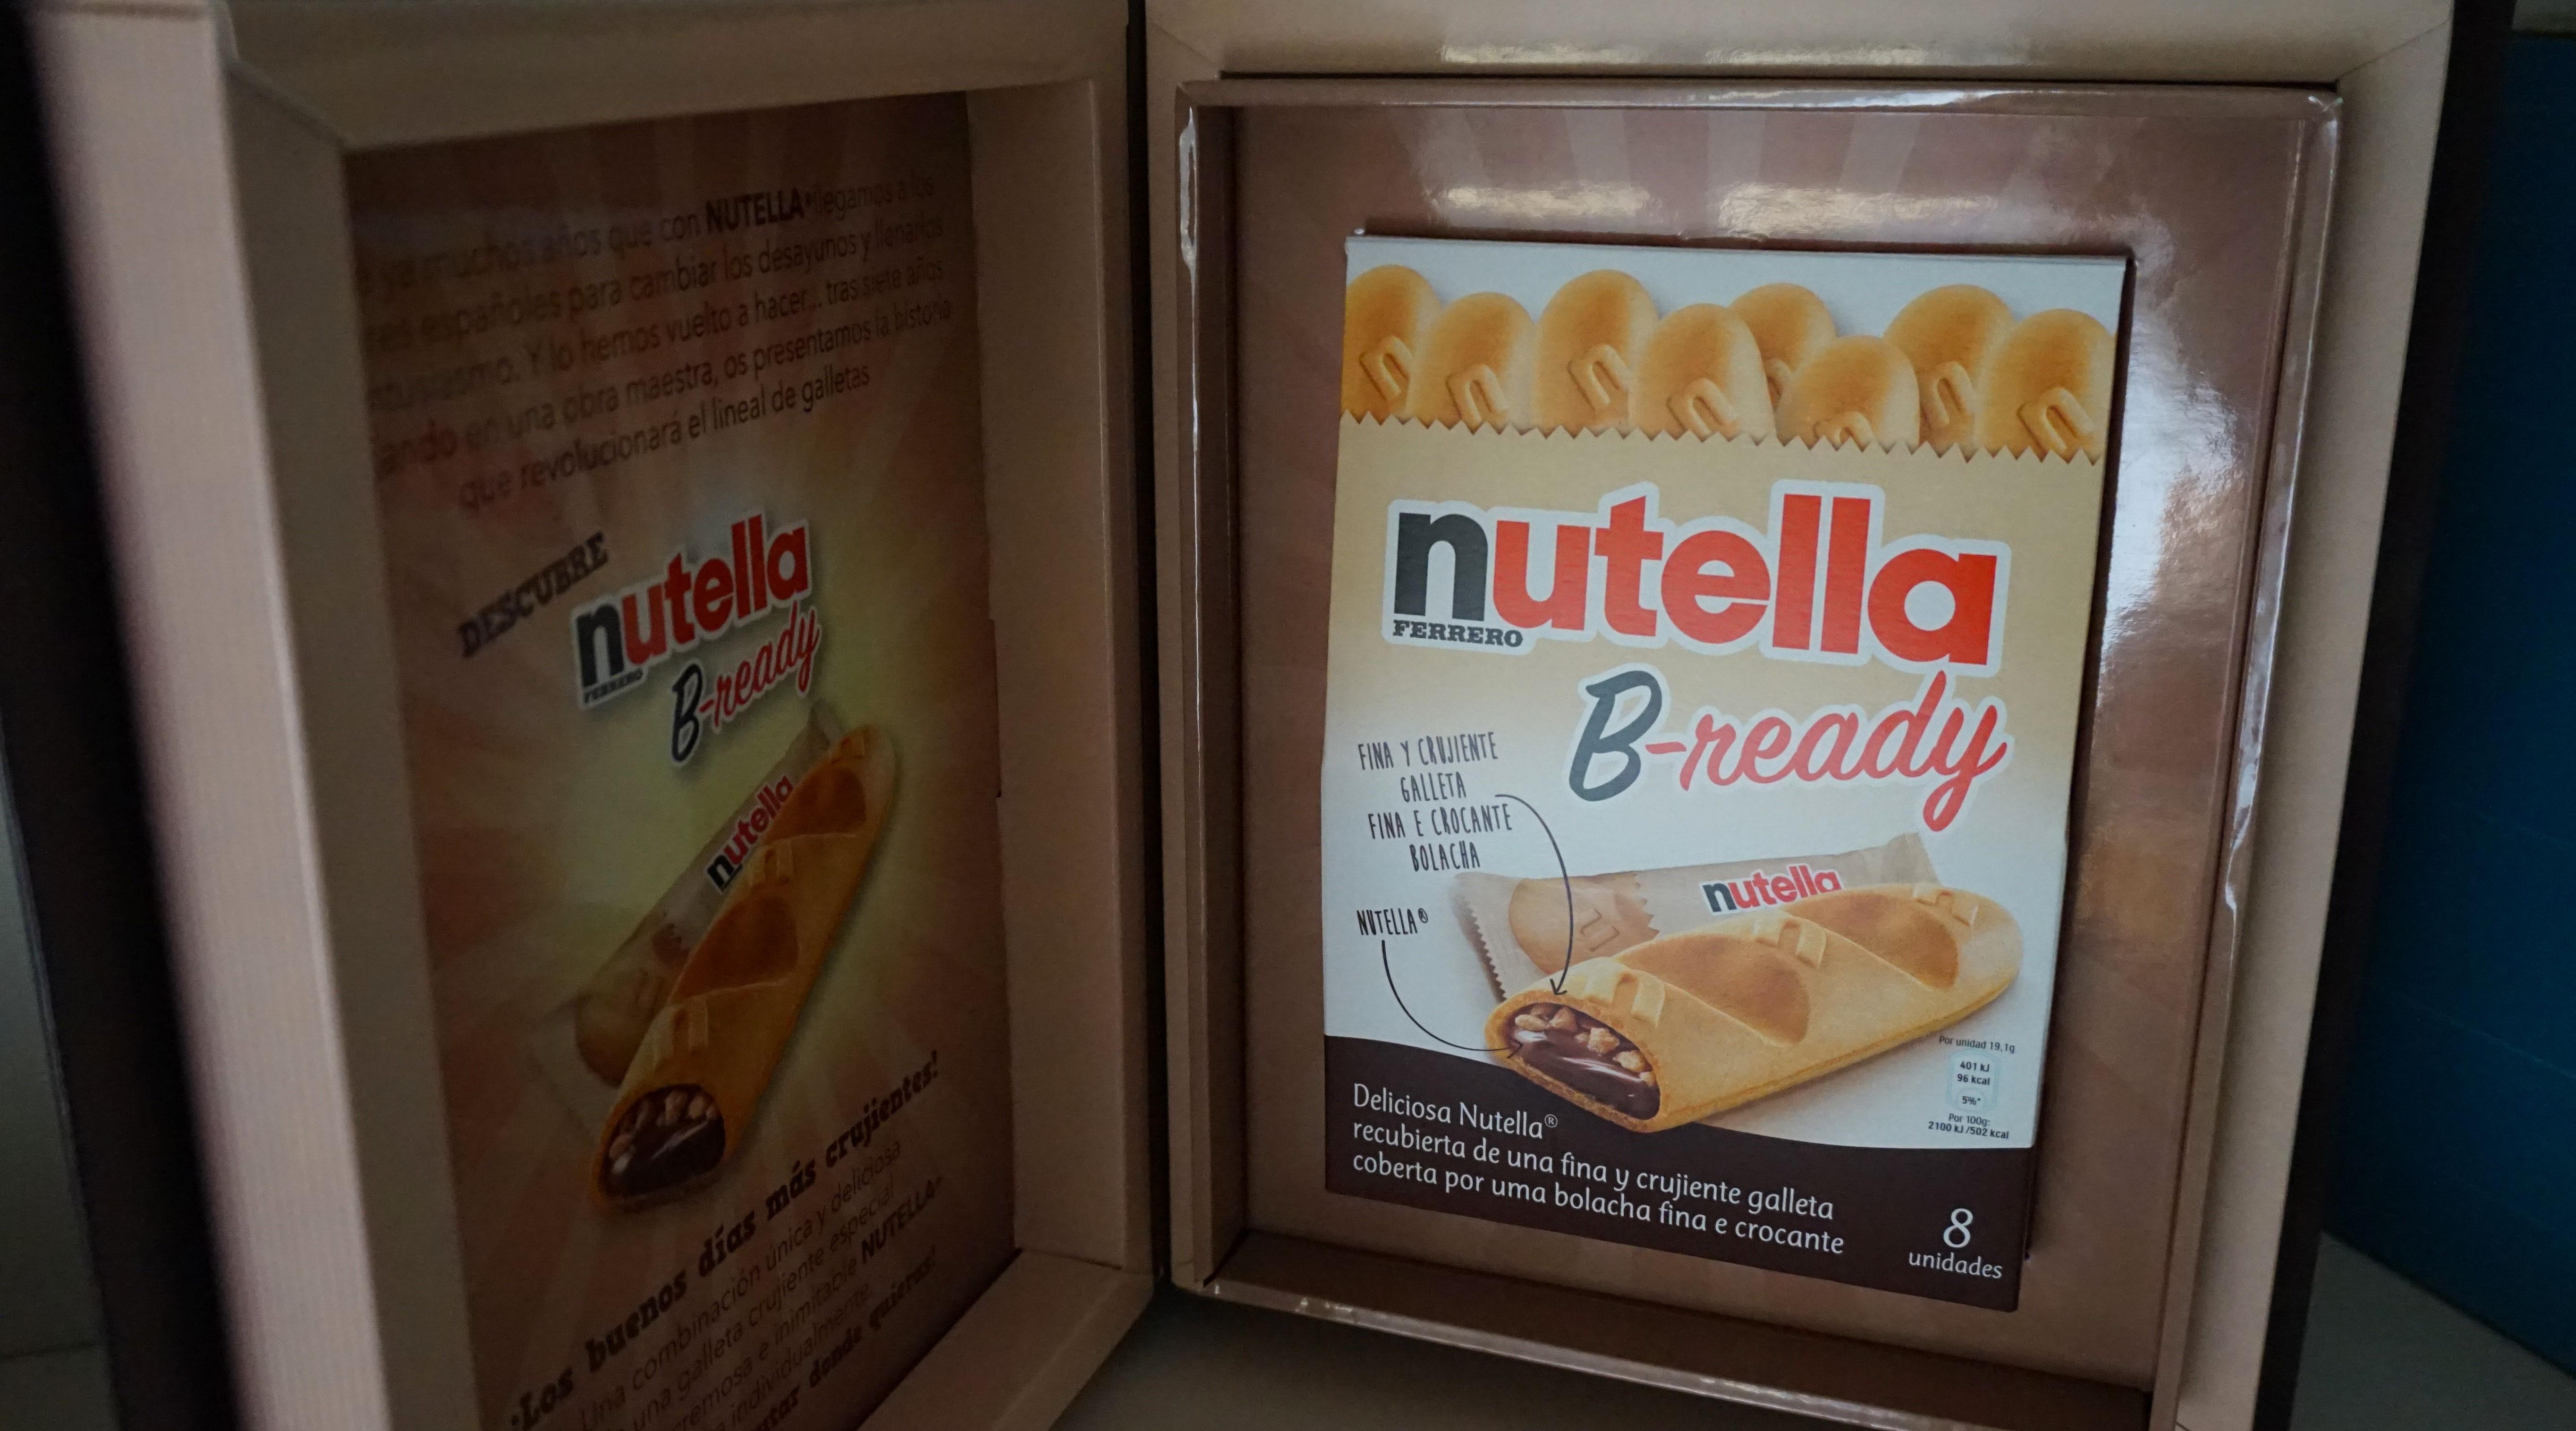 b ready nutella ferrero